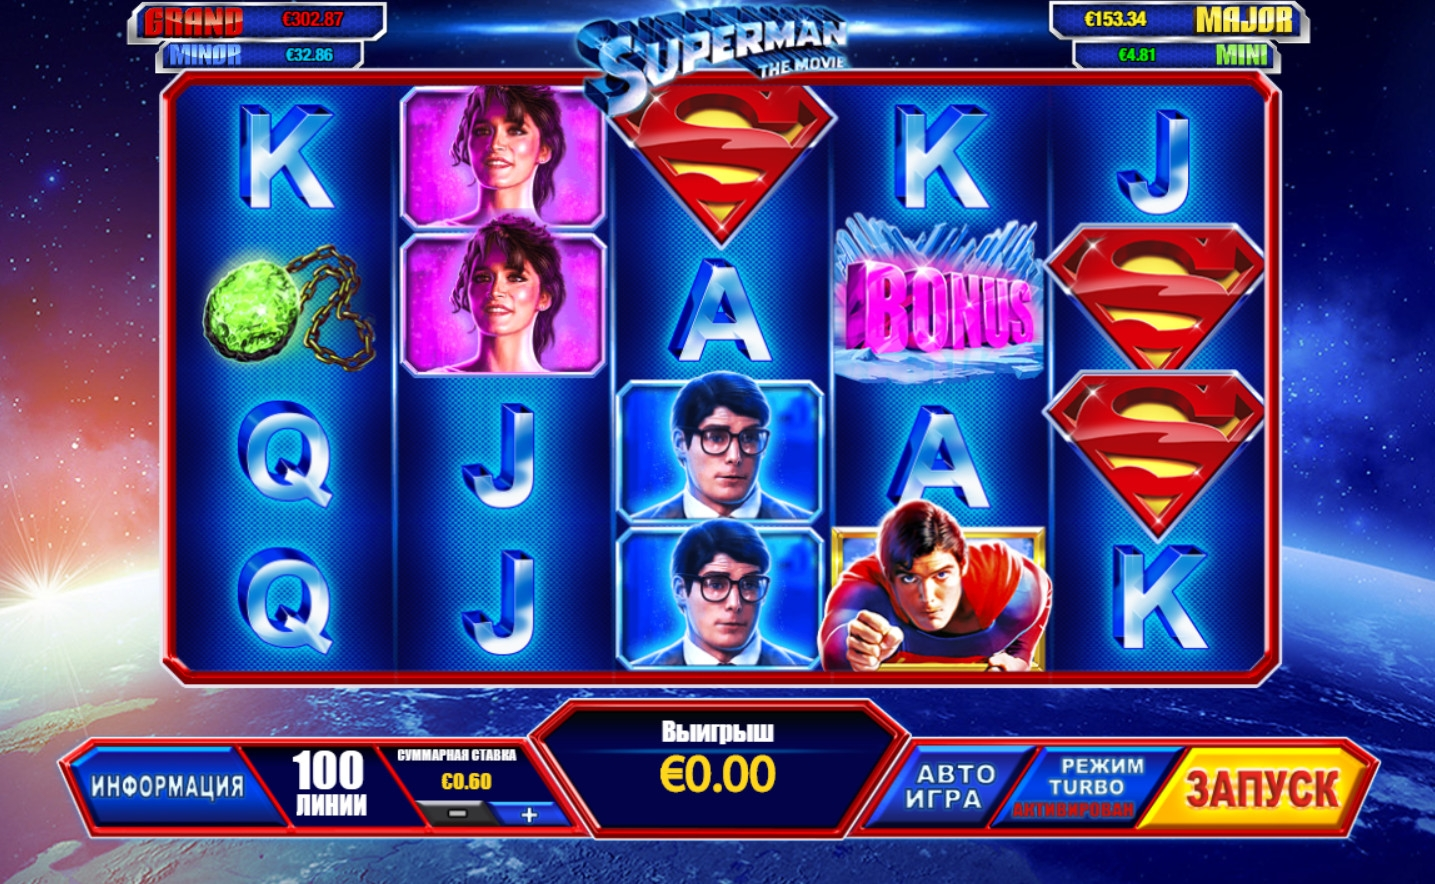 игровой автомат Superman the Movie